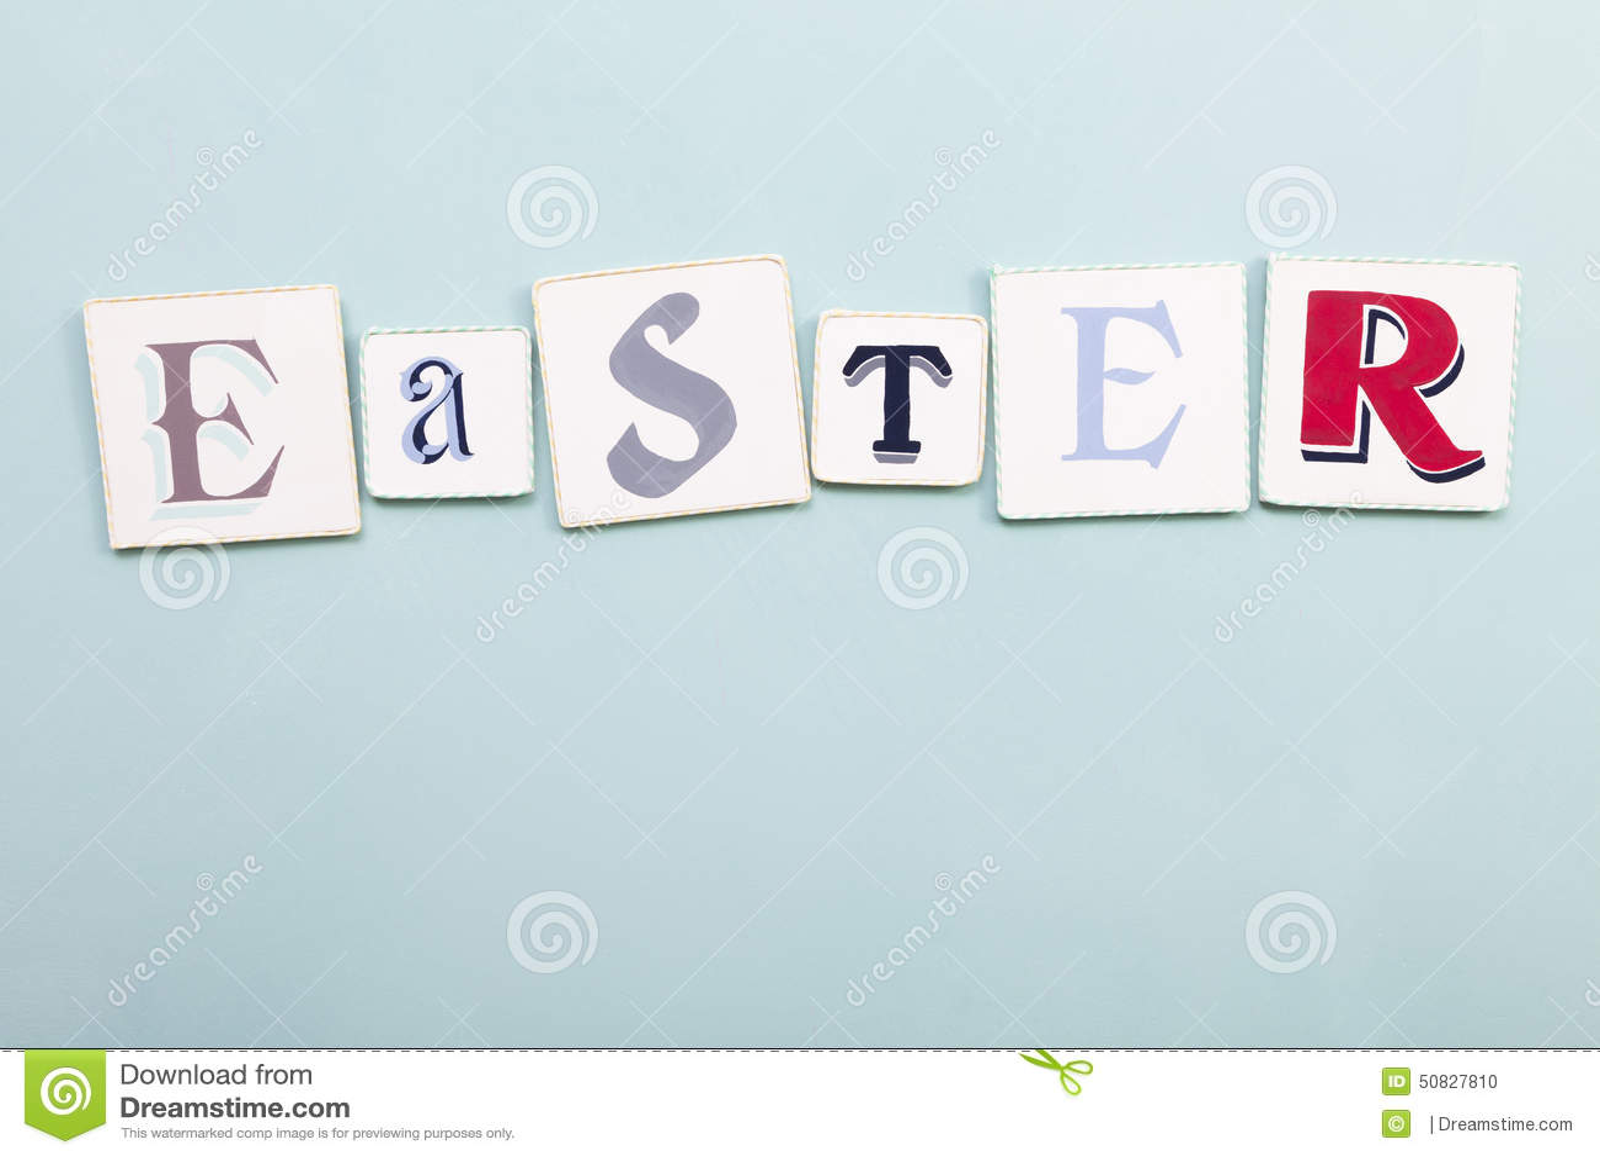 Easter signboard. Handwritten colors letters word. Light blue backgro